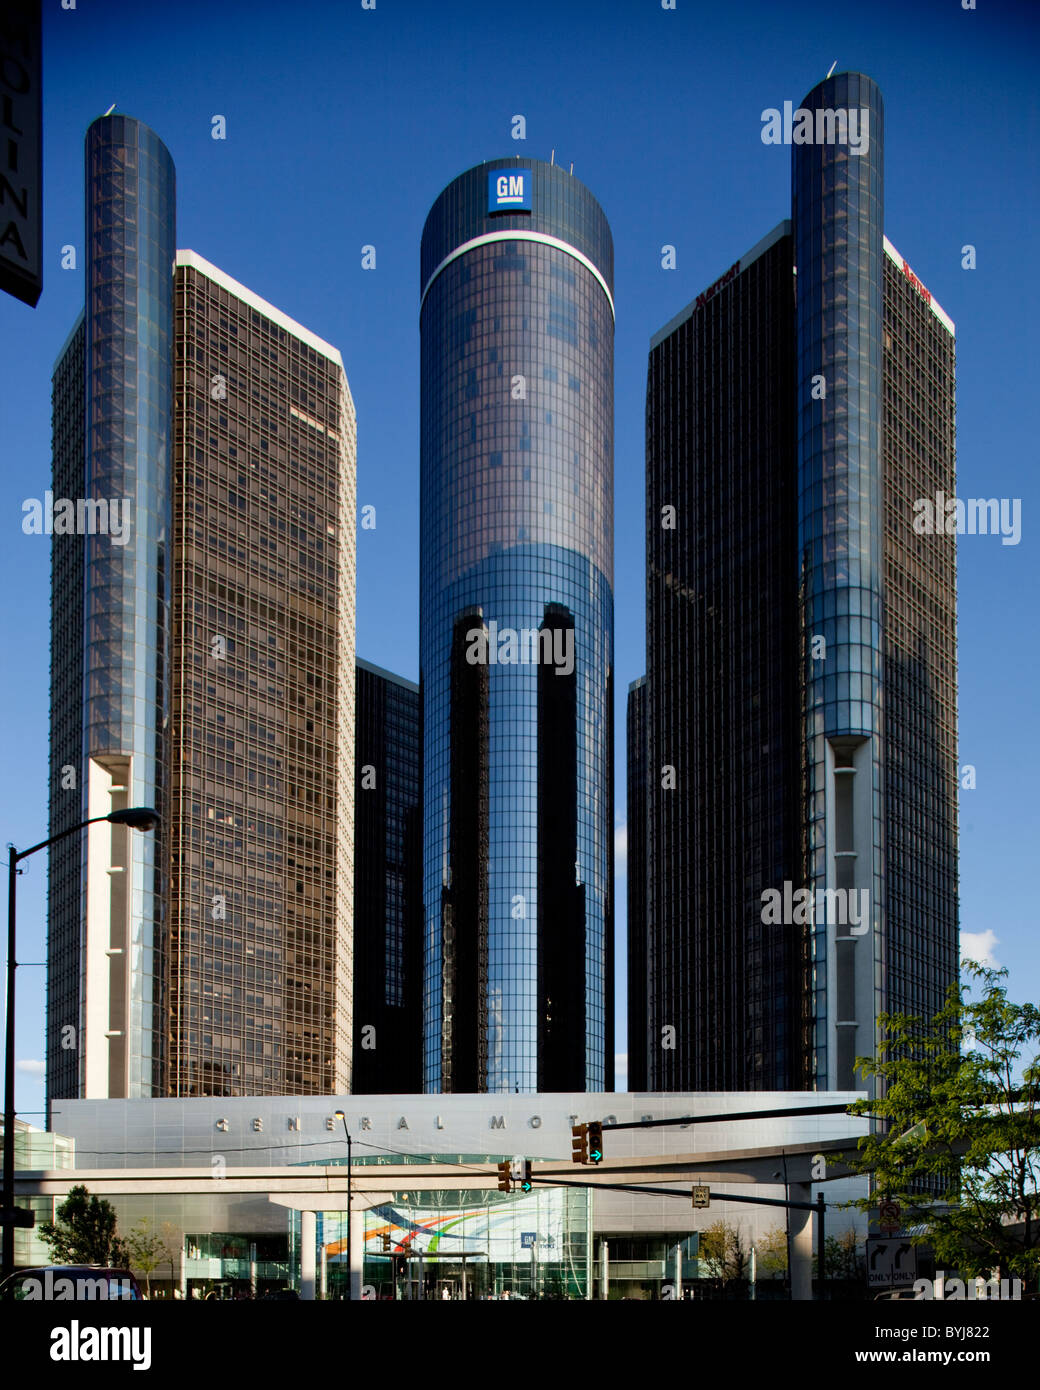 Detroit skyline gm renaissance center stock photos for General motors corporate office